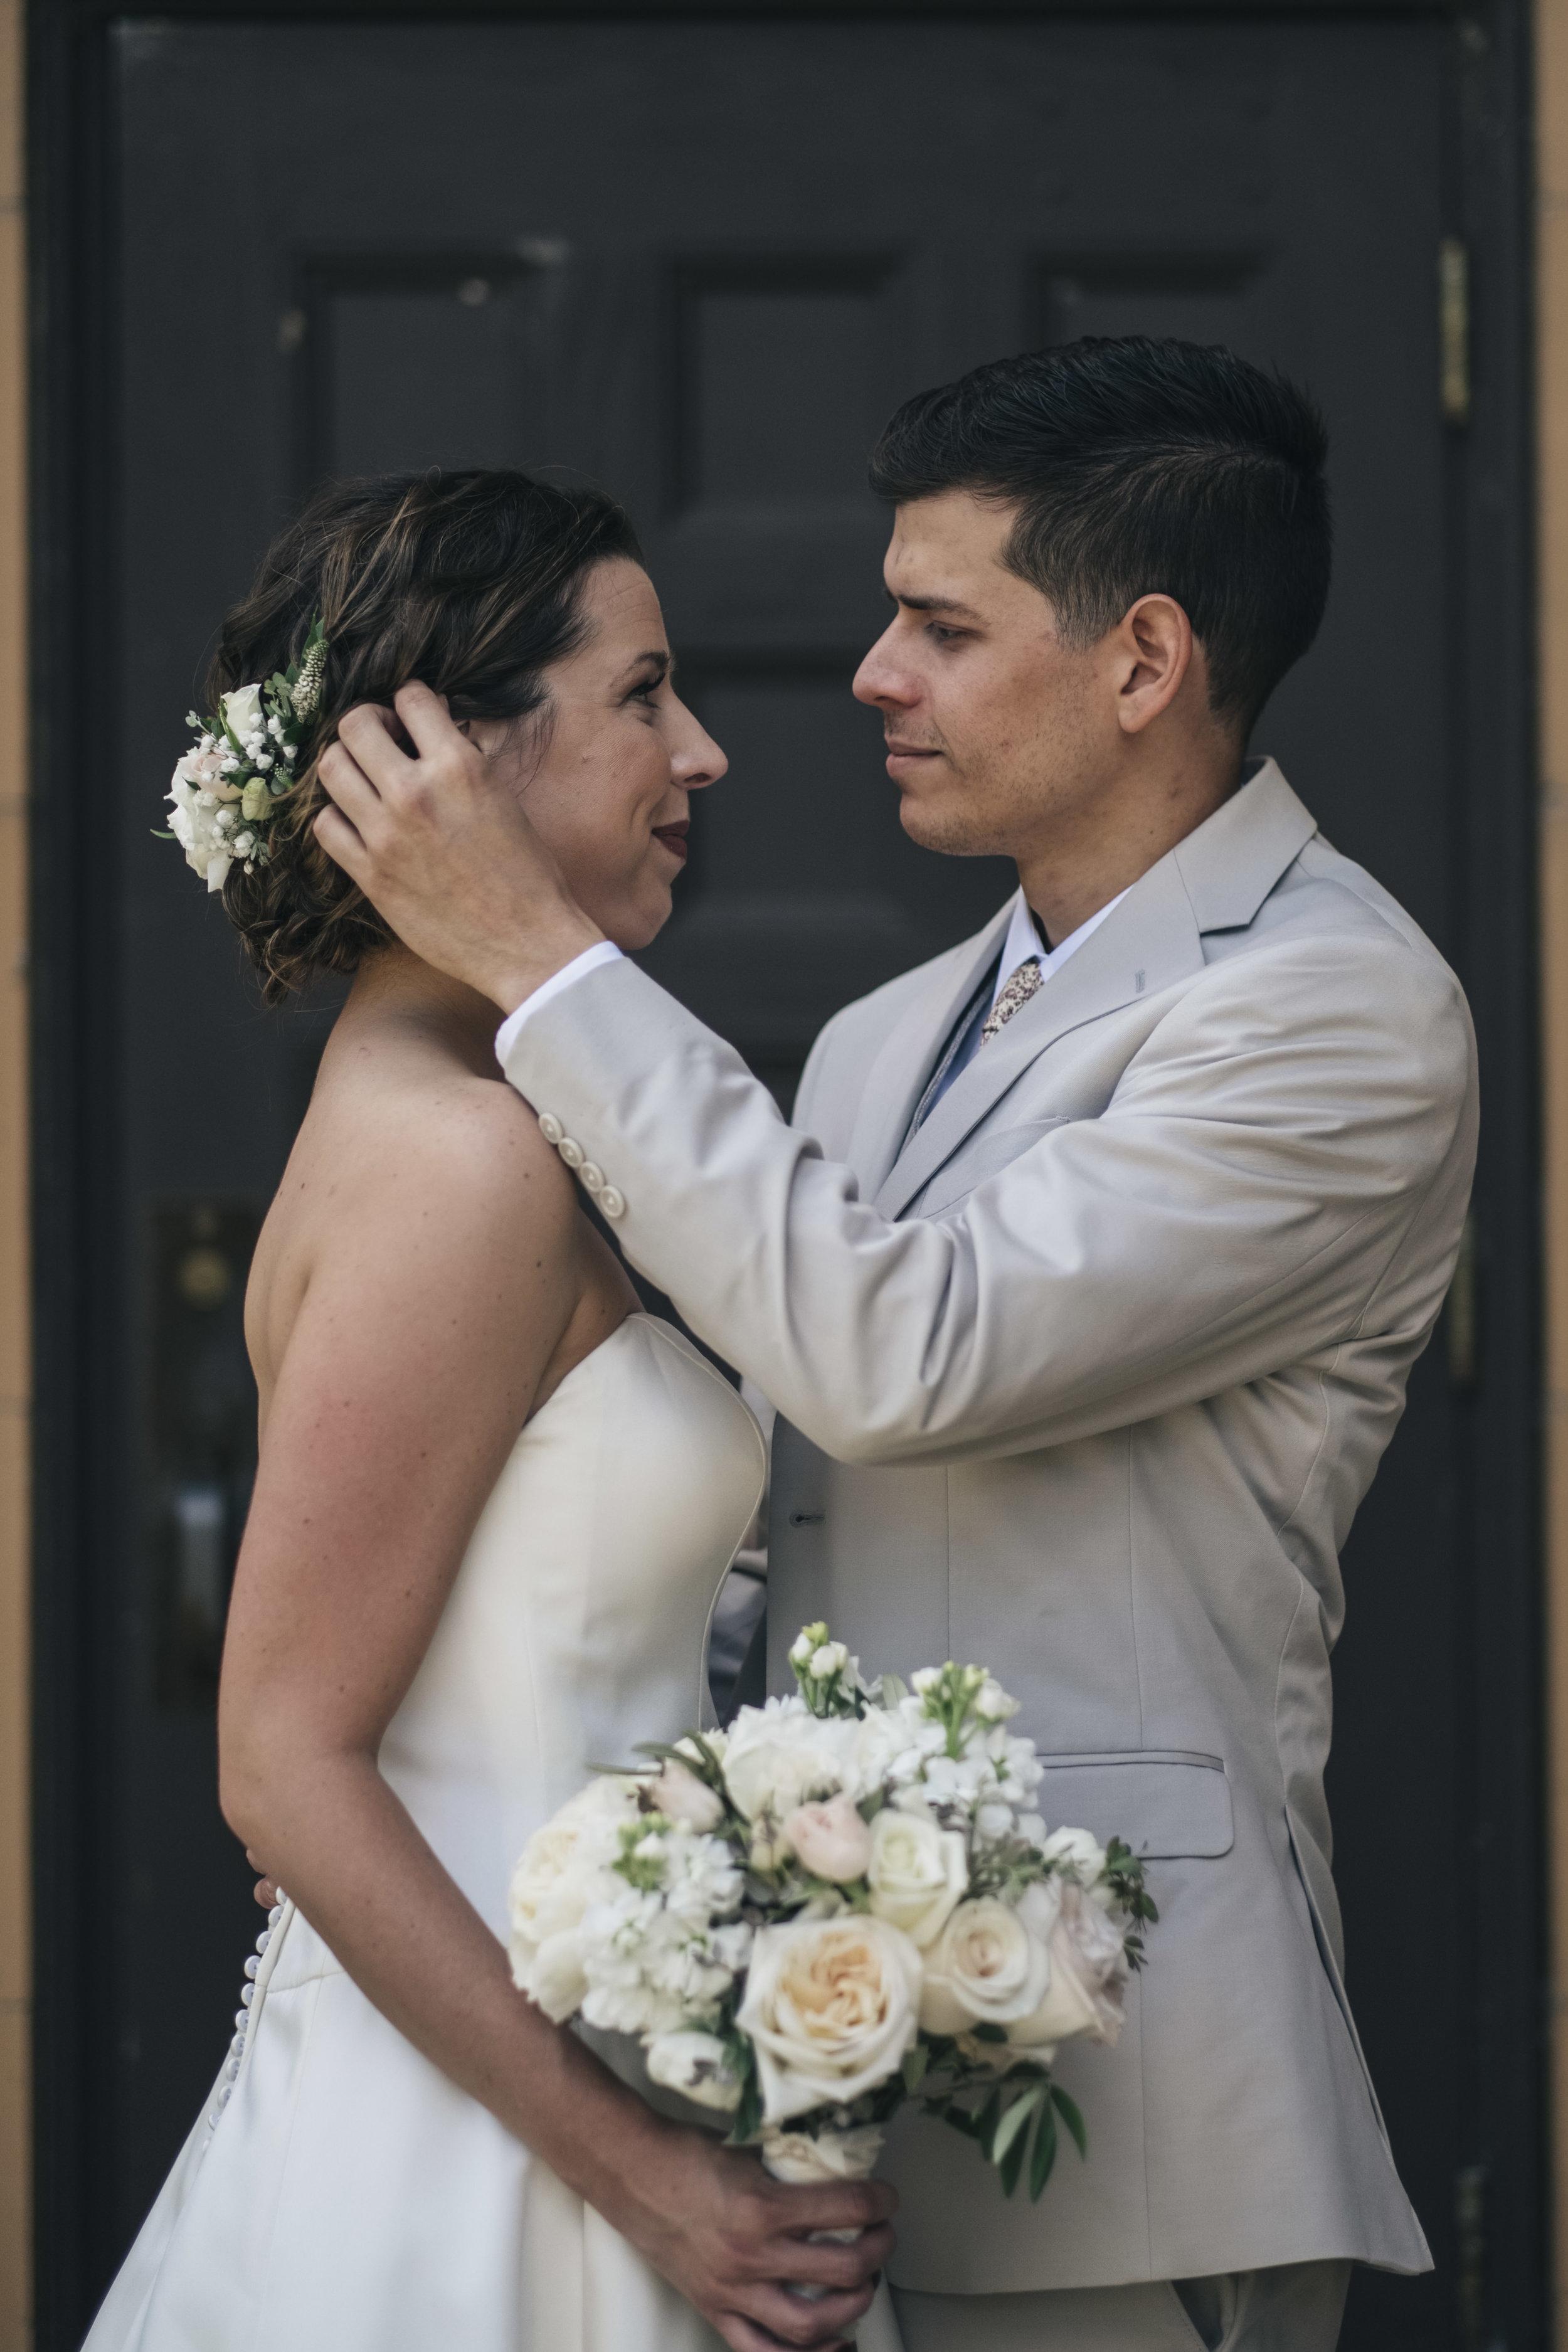 Ohio wedding photography at Nazareth Hall.